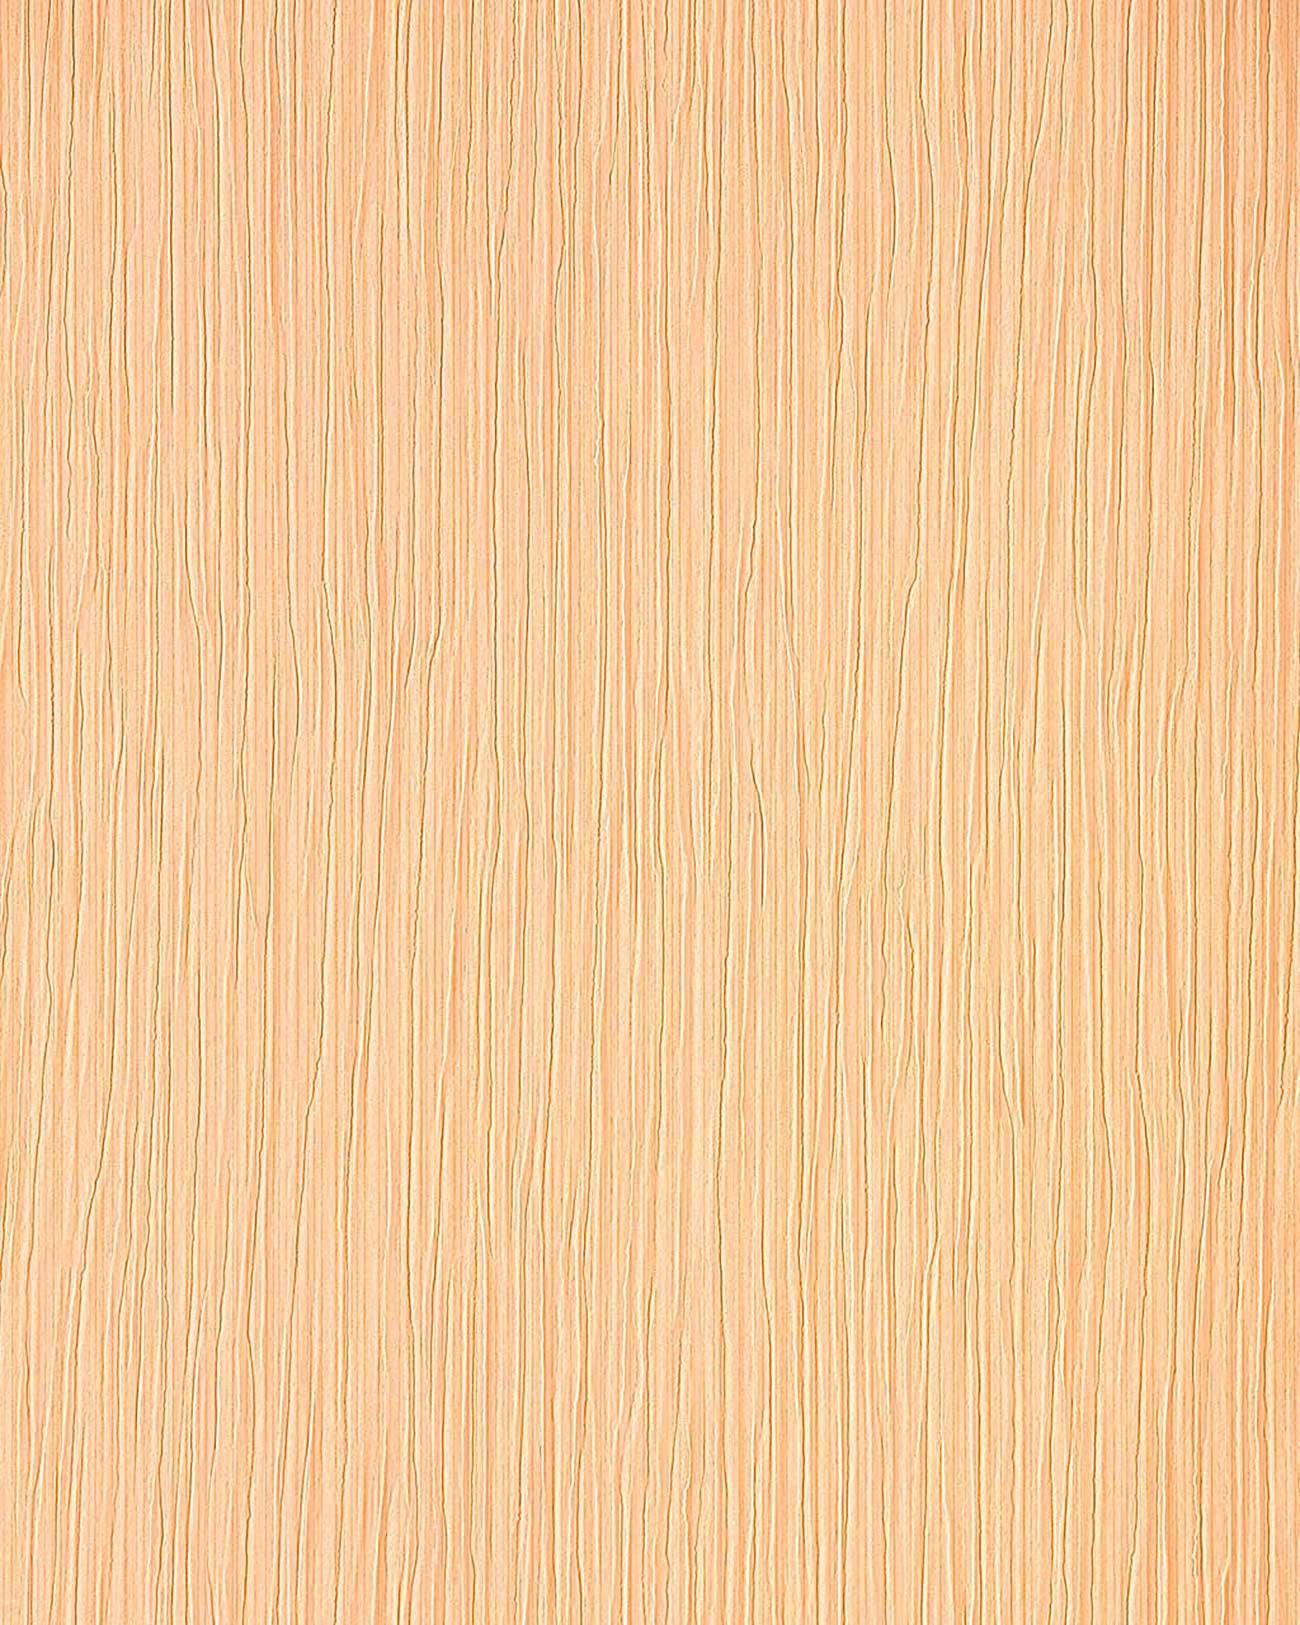 Papel pintado monocolor moderno con textura y relieve edem for Papel con relieve para pared